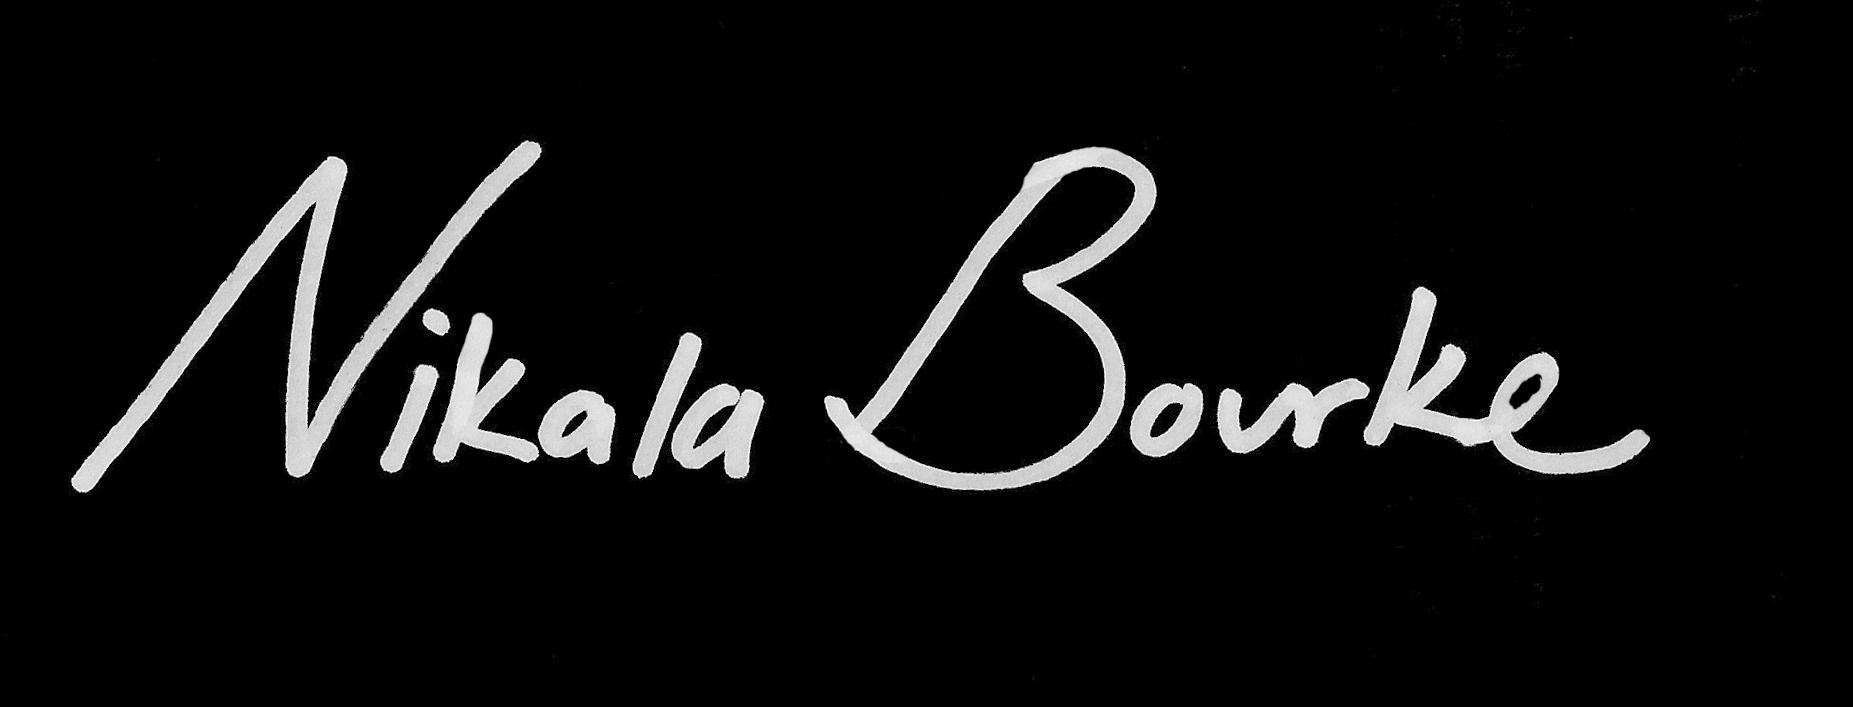 Nikala bourke's Signature